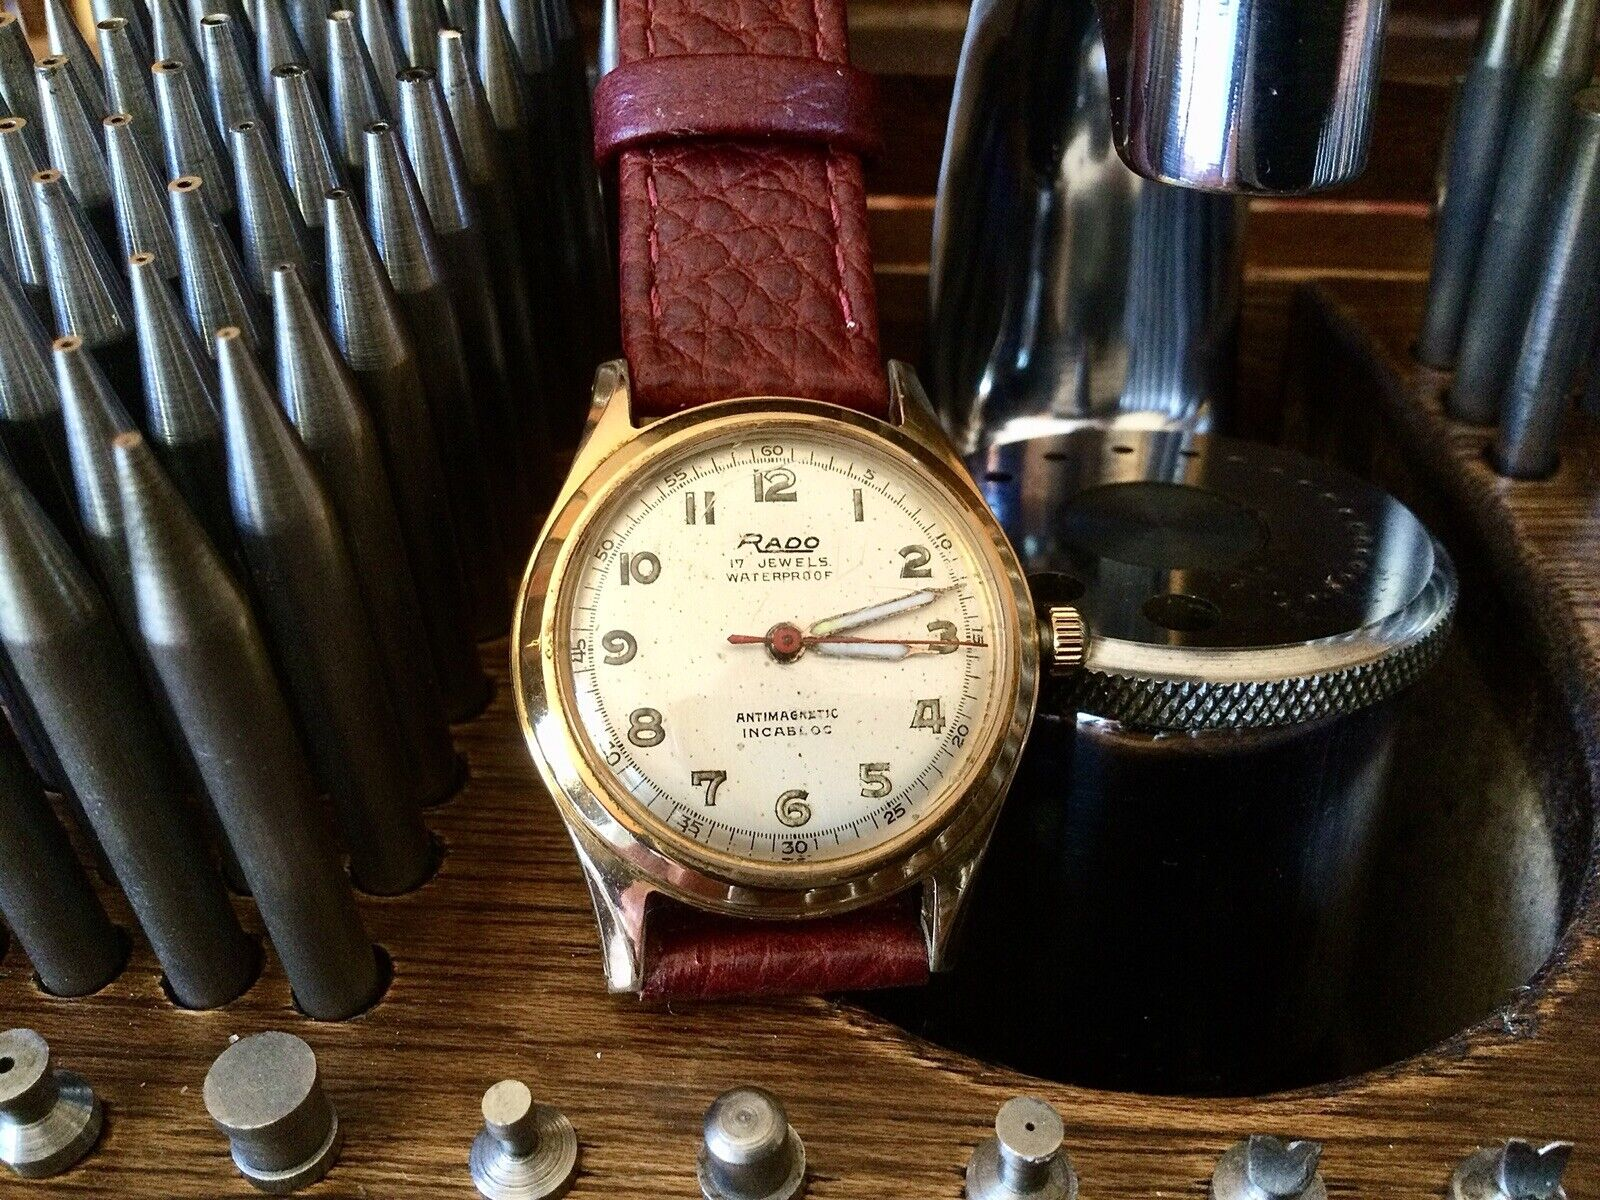 Rado. Reloj Vintage. All Full Serviced. In Working Order